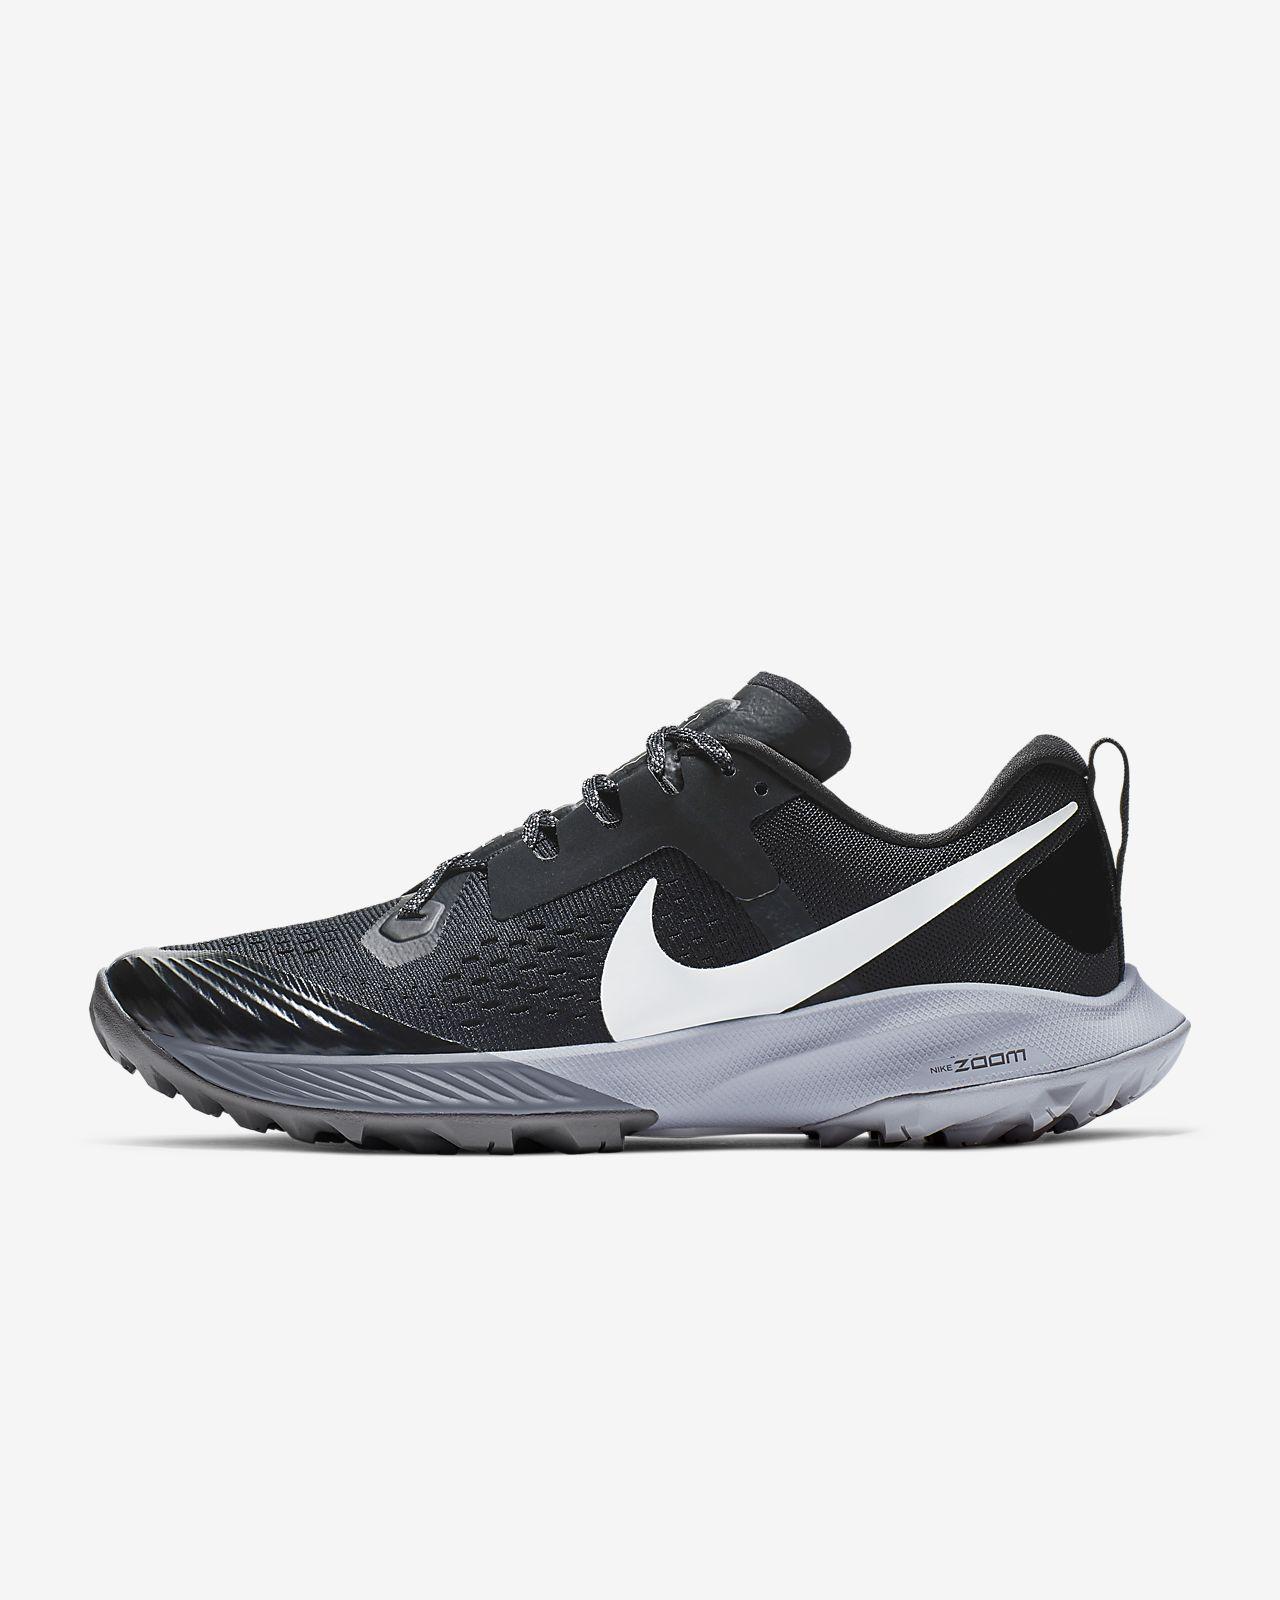 Chaussure de running sur sentier Nike Air Zoom Terra Kiger 5 pour Femme